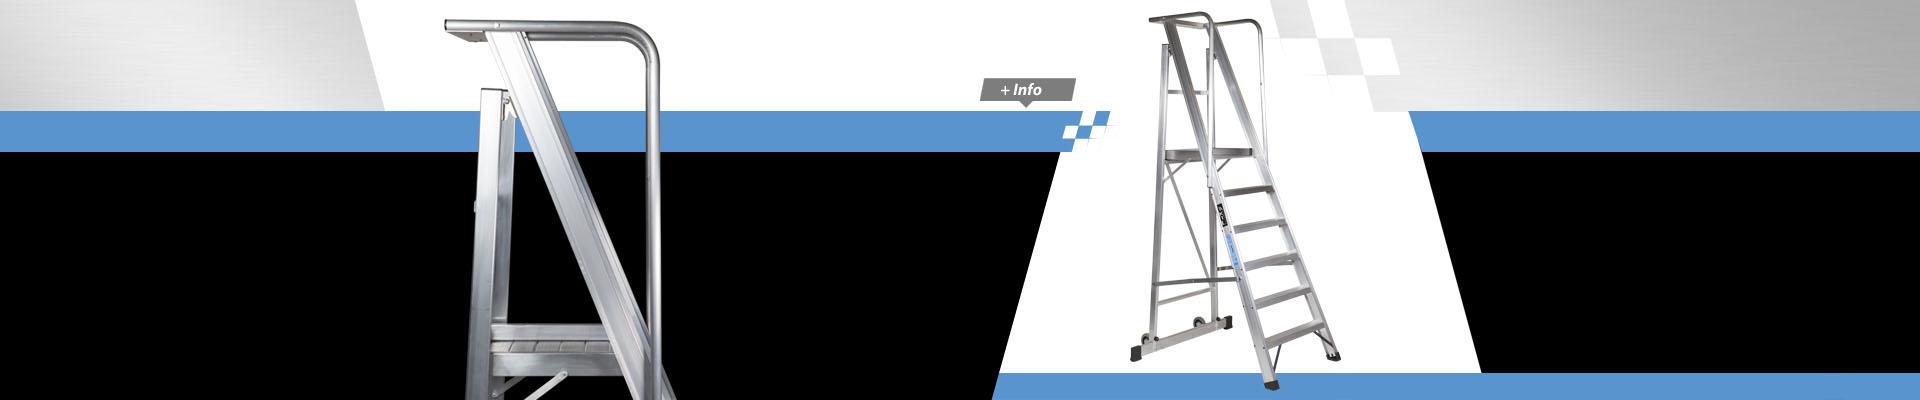 BANNER1-escaleras-andamios1